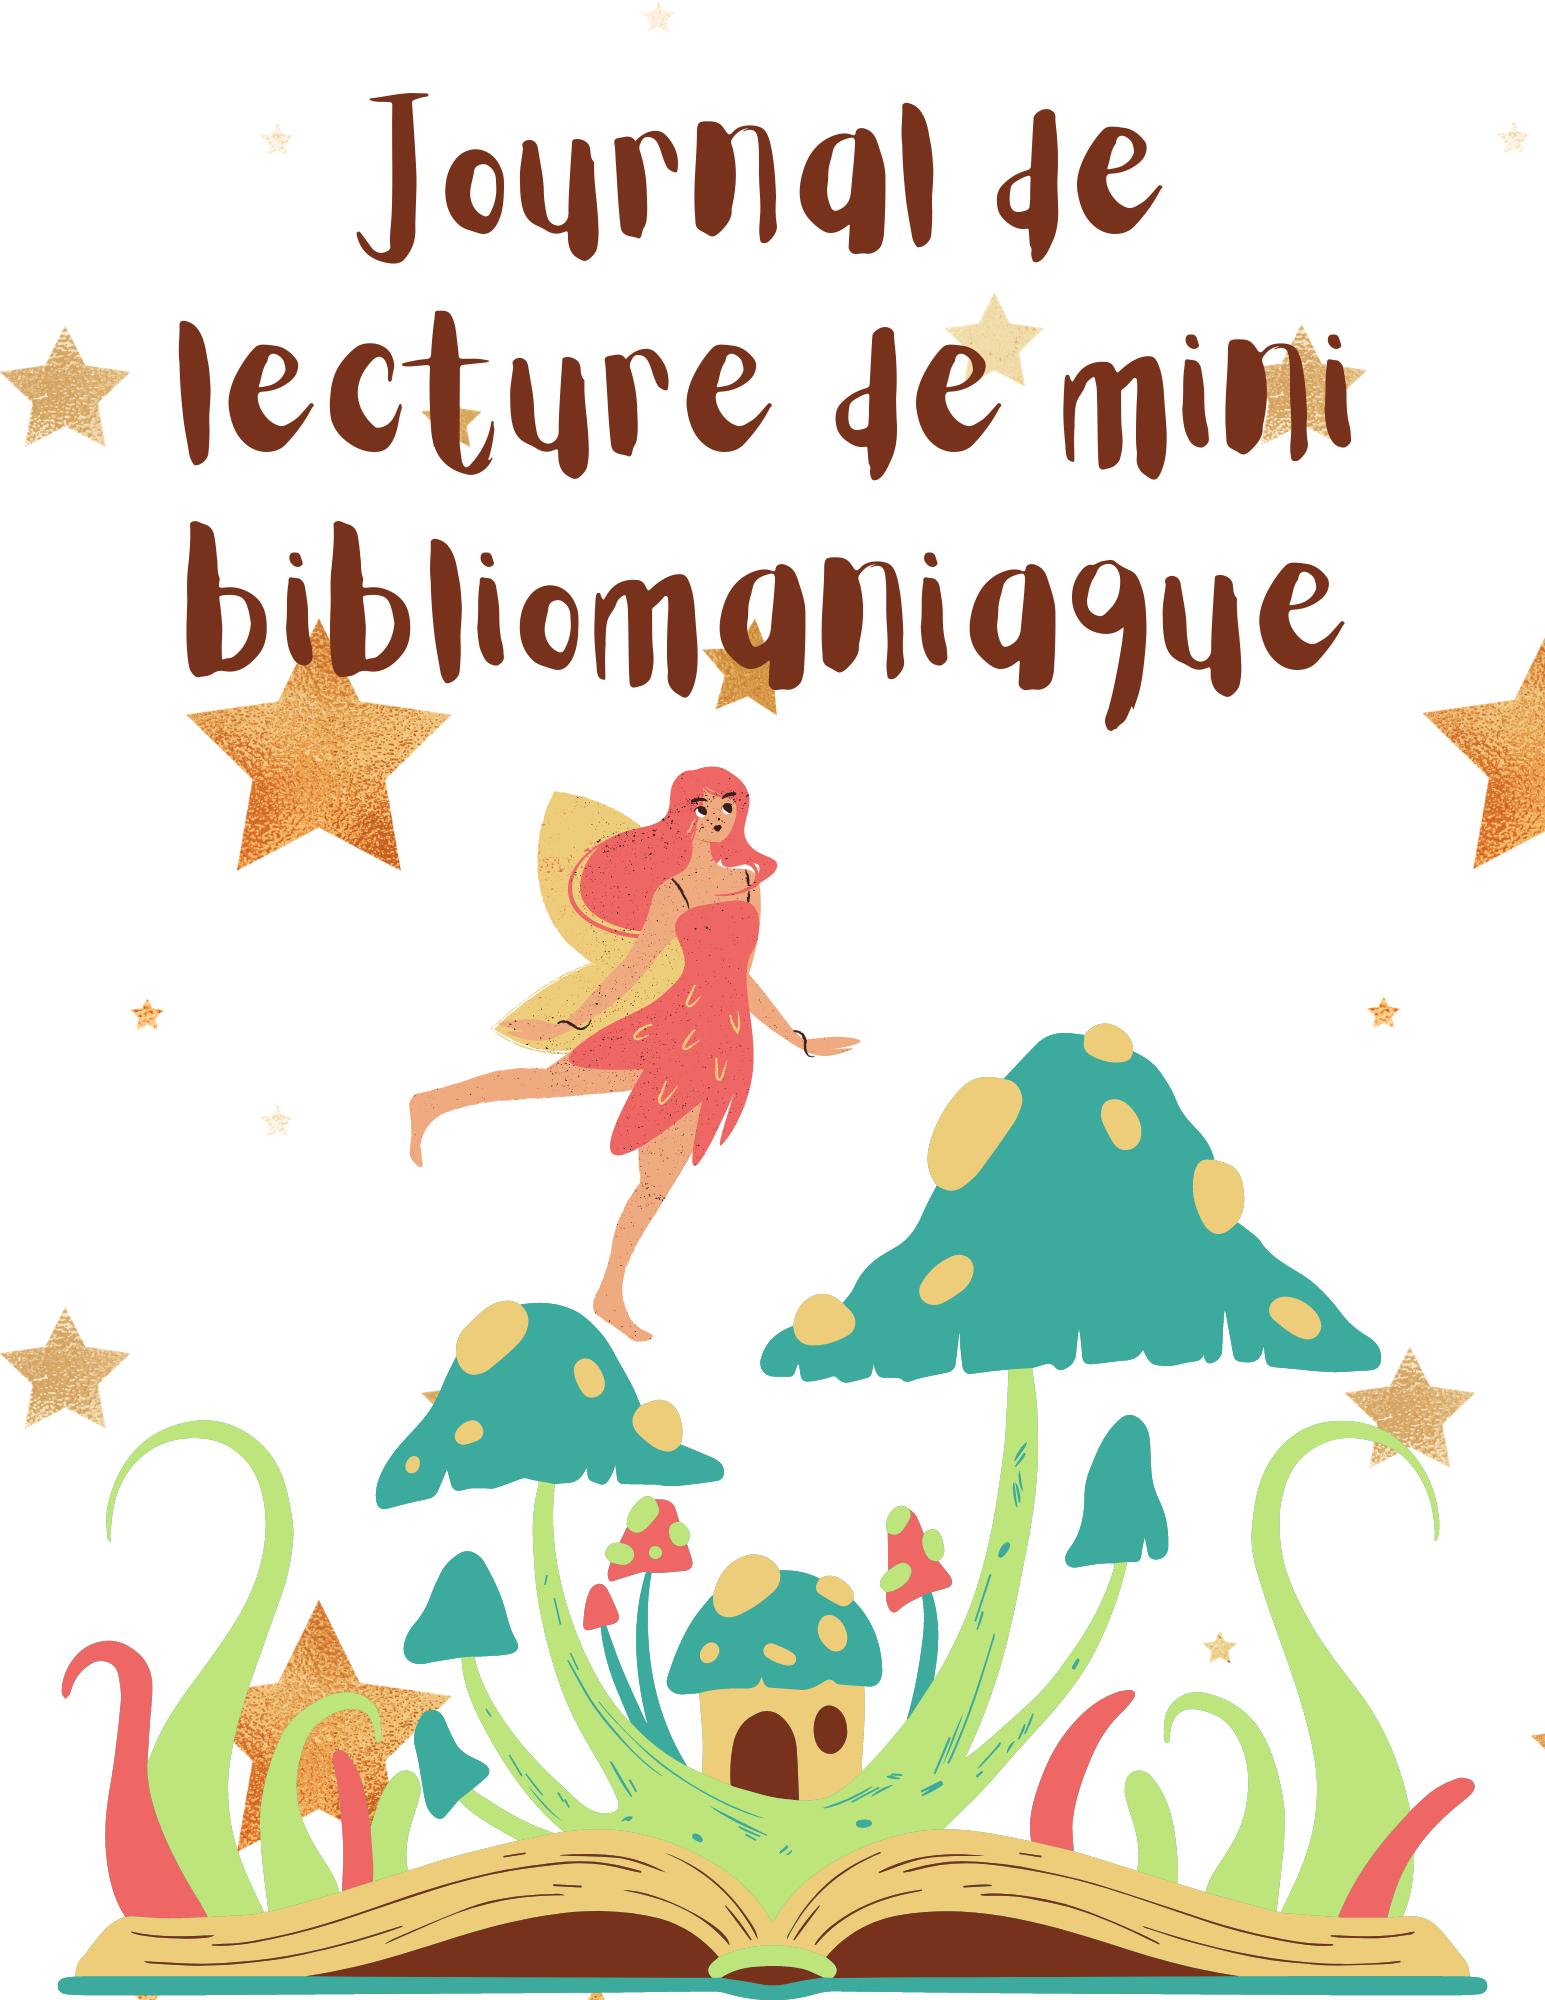 journal de mini bibliomaniaque